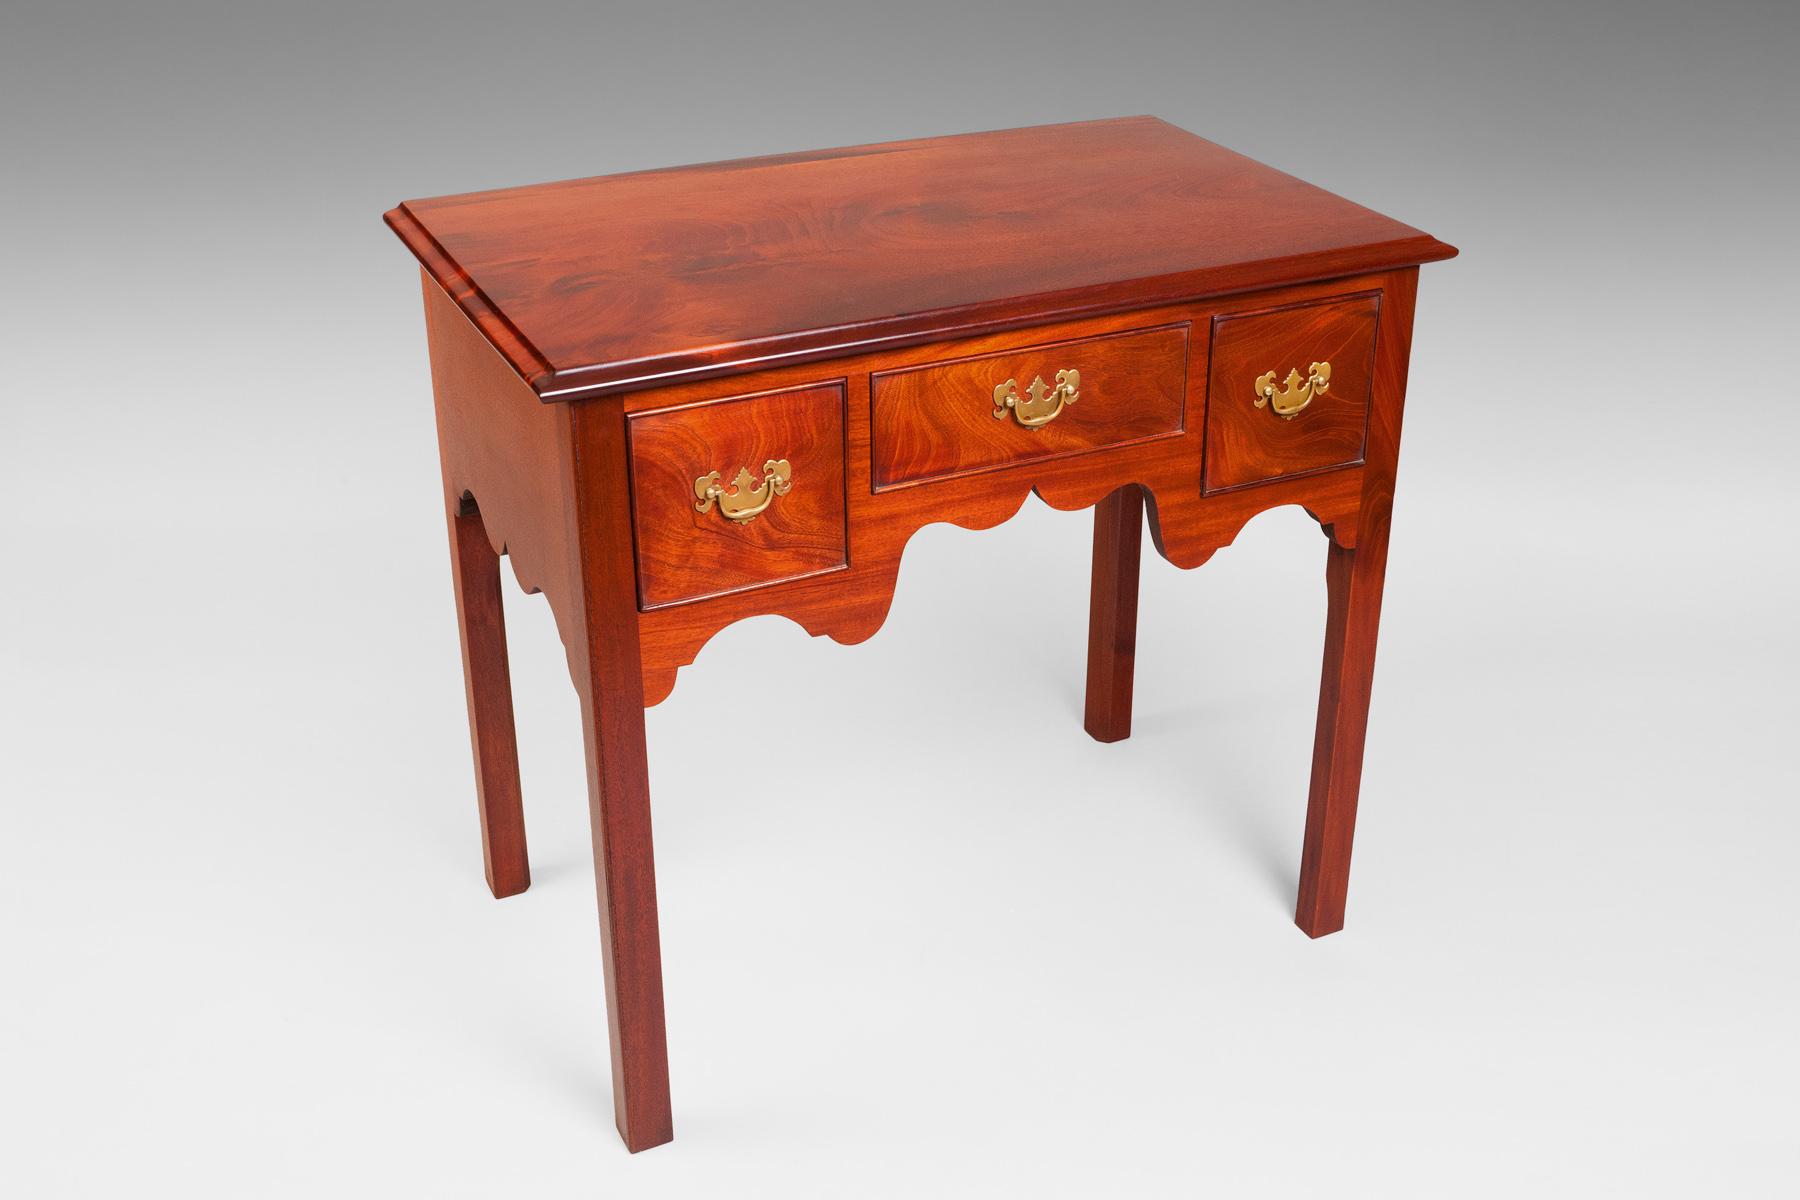 rob cart hall chest-1335 - FINAL.jpg